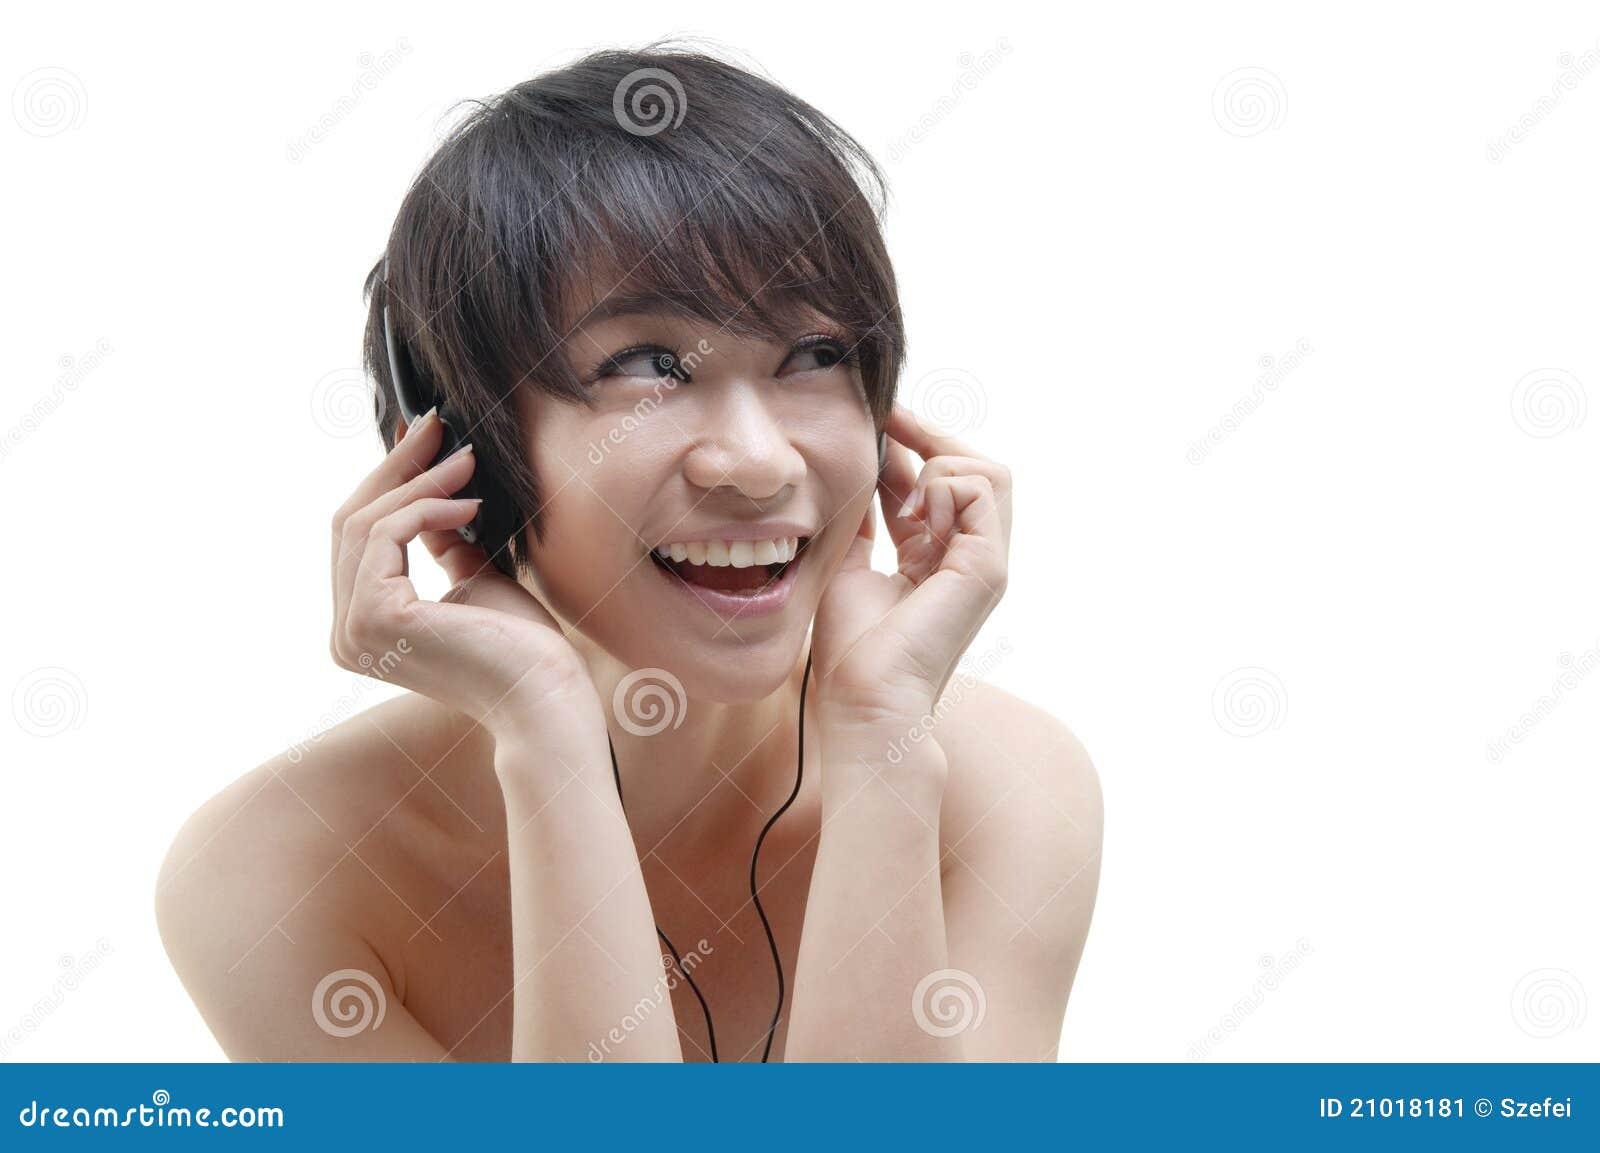 listening-to-music-21018181.jpg